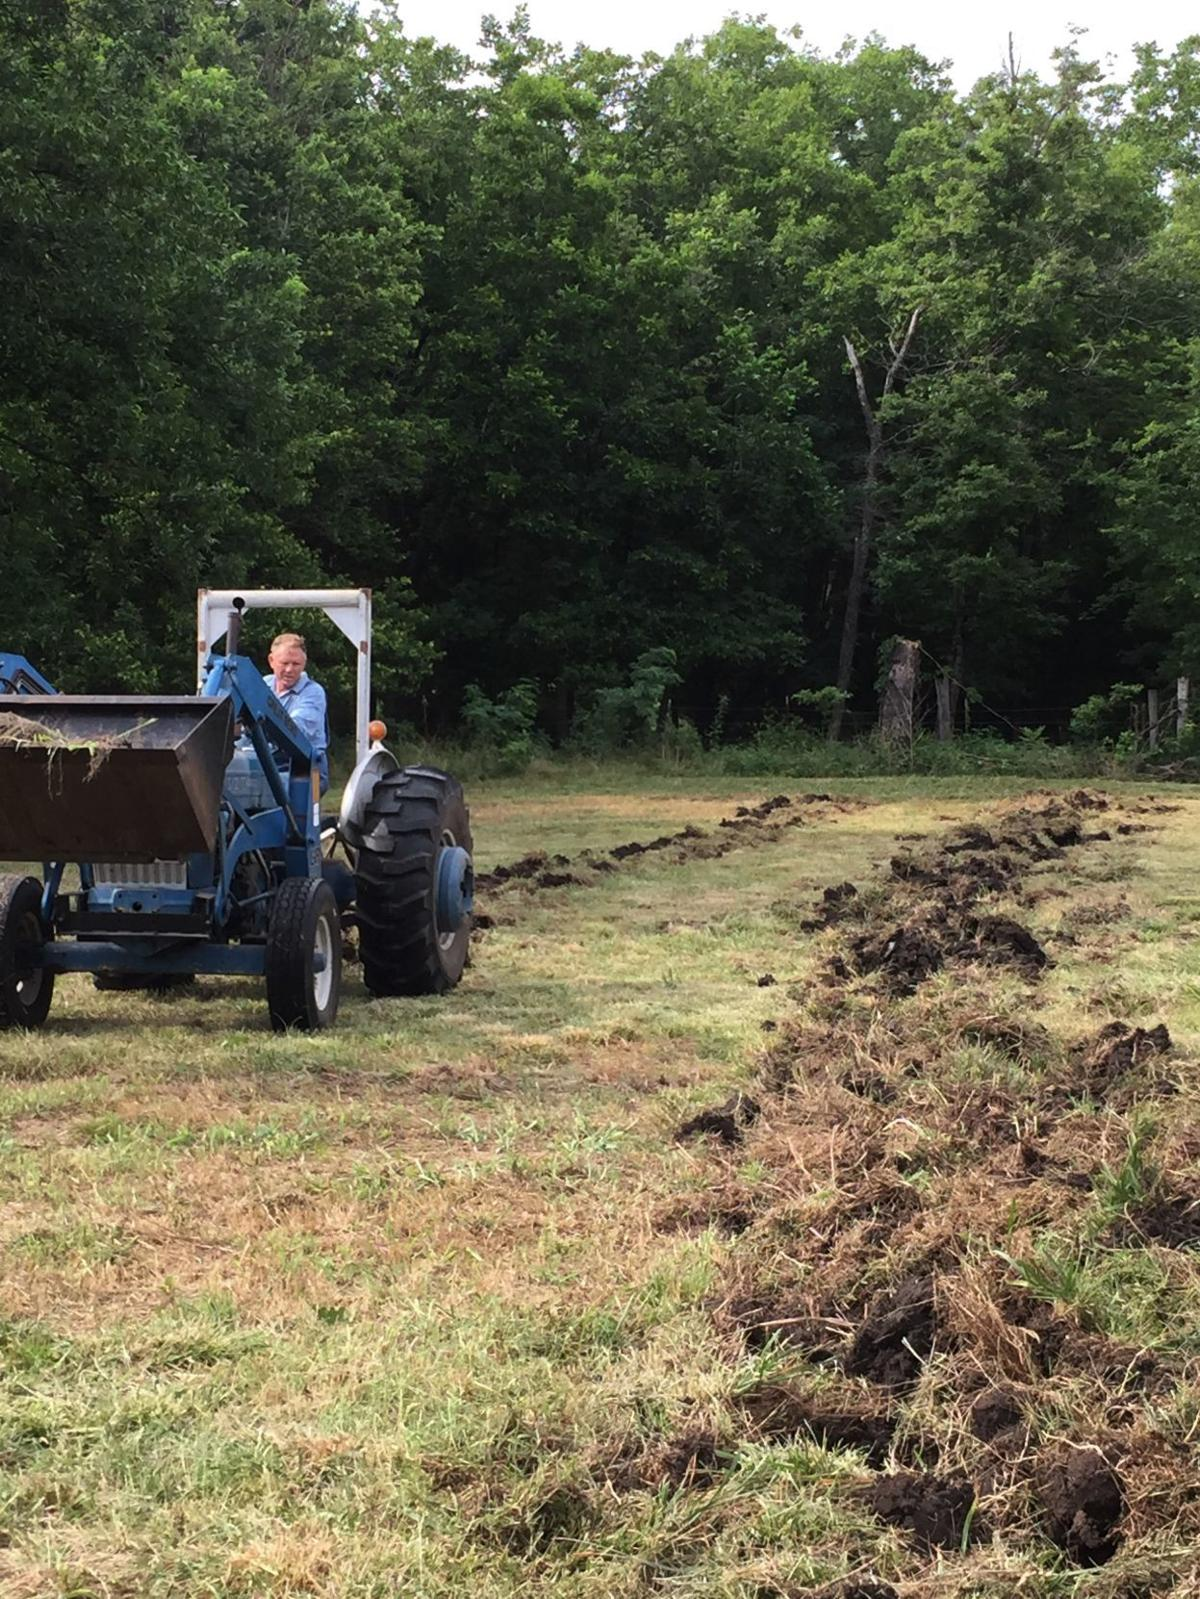 Here S Why Actress Jennifer Garner Is Farming In Locust Grove Lifestyles Tulsaworld Com